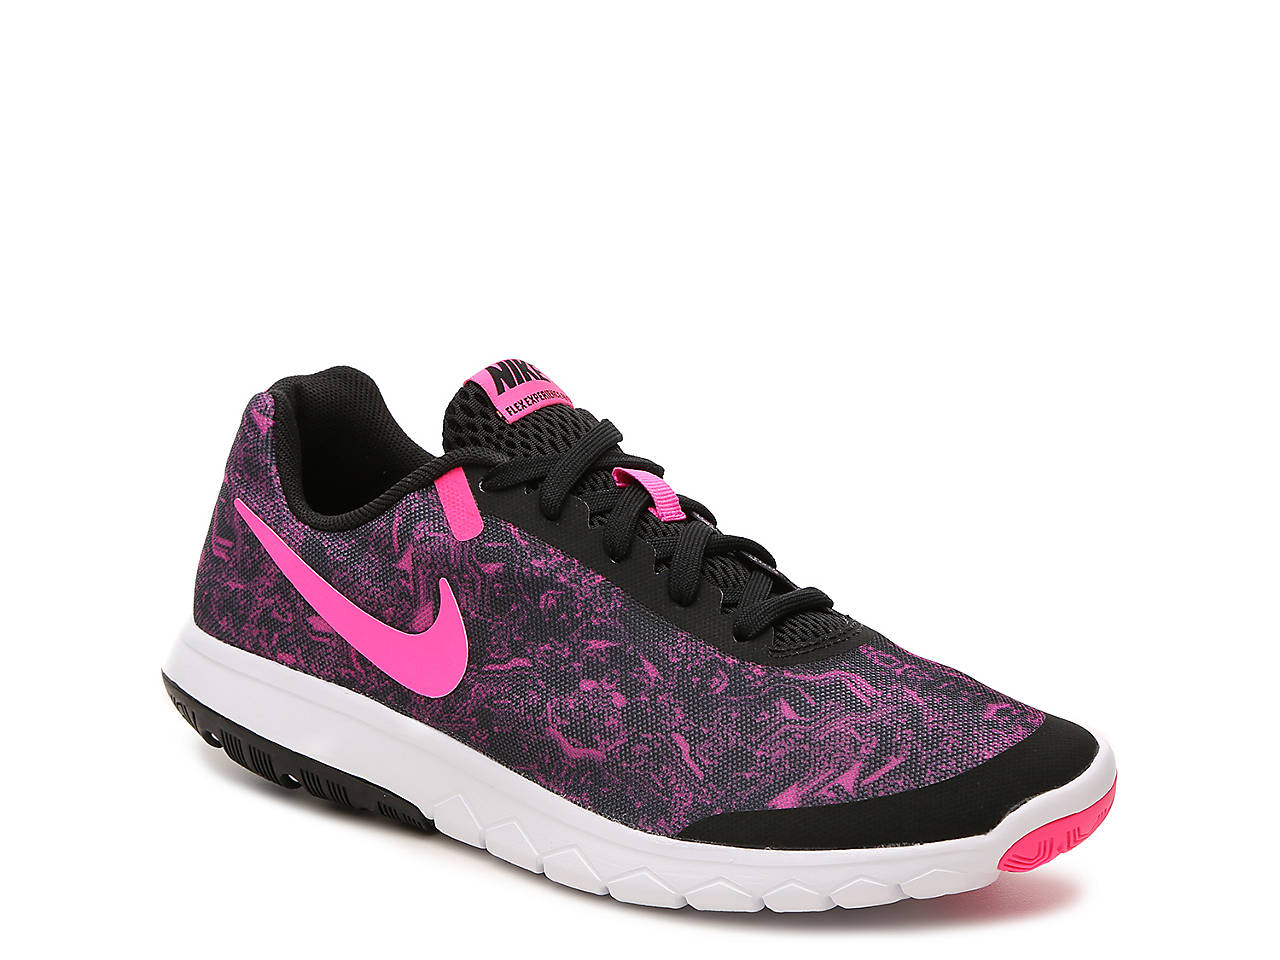 Nike. Flex Experience Run 5 Premium Lightweight Running Shoe - Women s 6fc4eabda